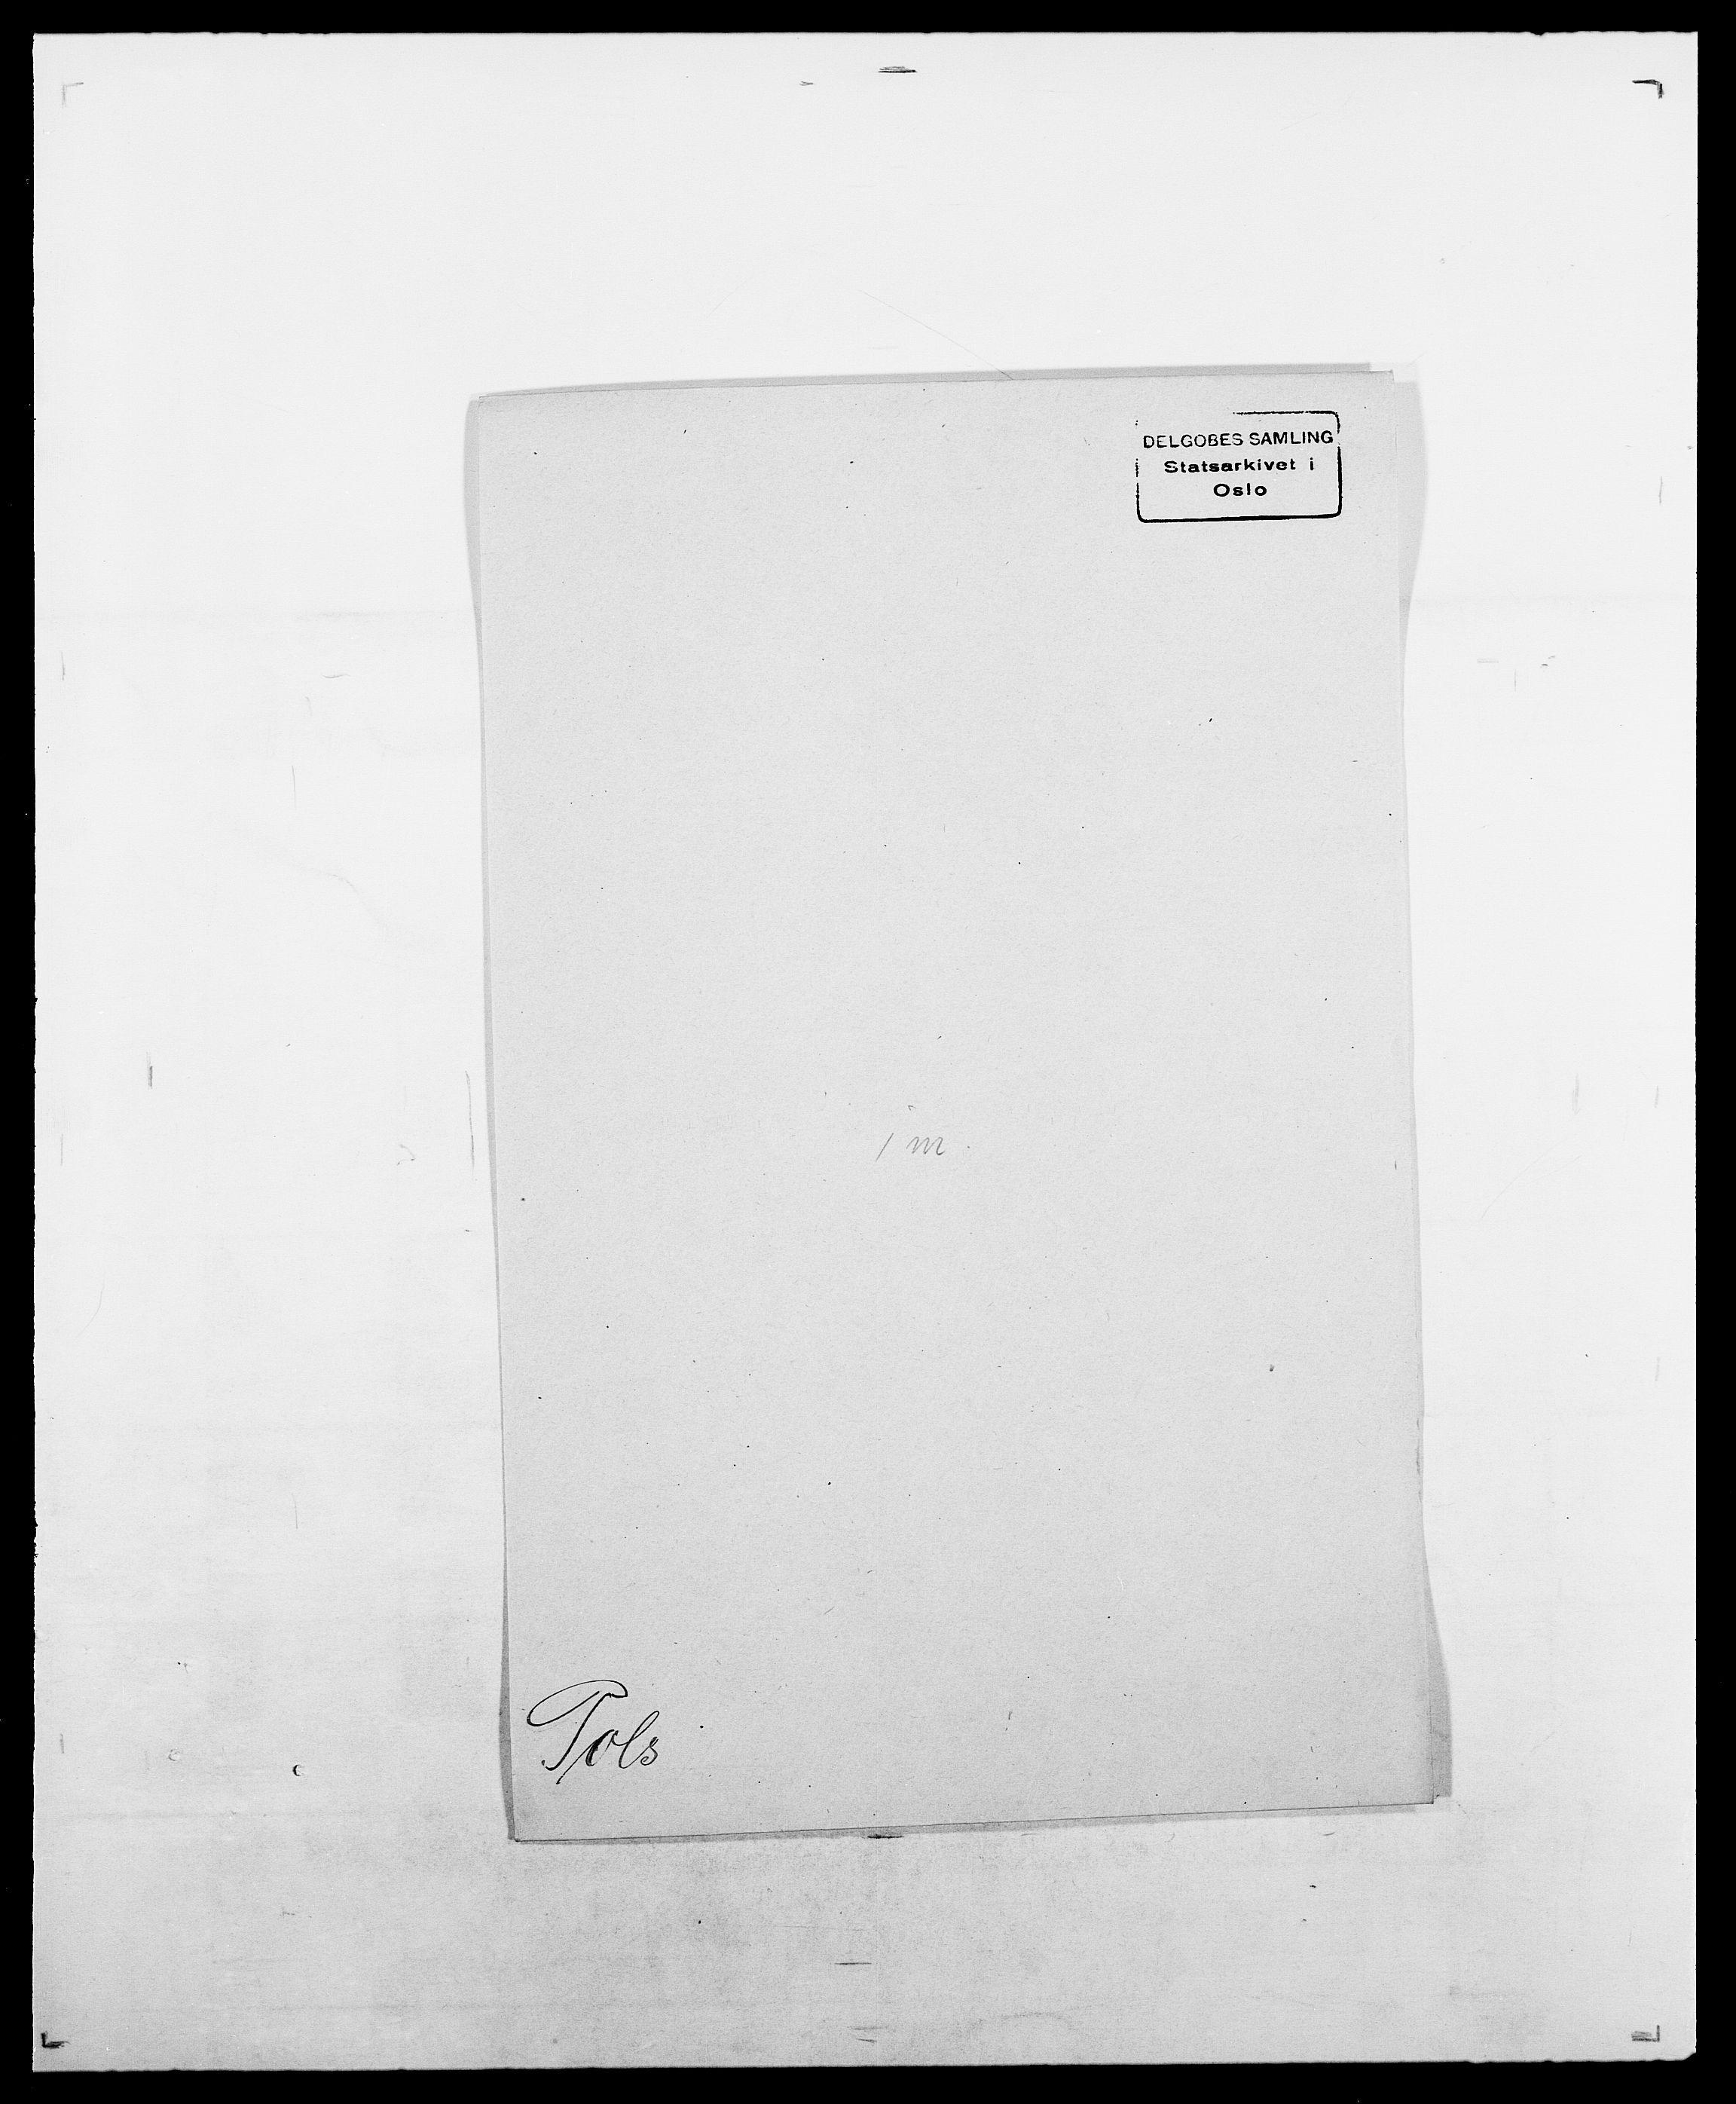 SAO, Delgobe, Charles Antoine - samling, D/Da/L0031: de Place - Raaum, s. 197